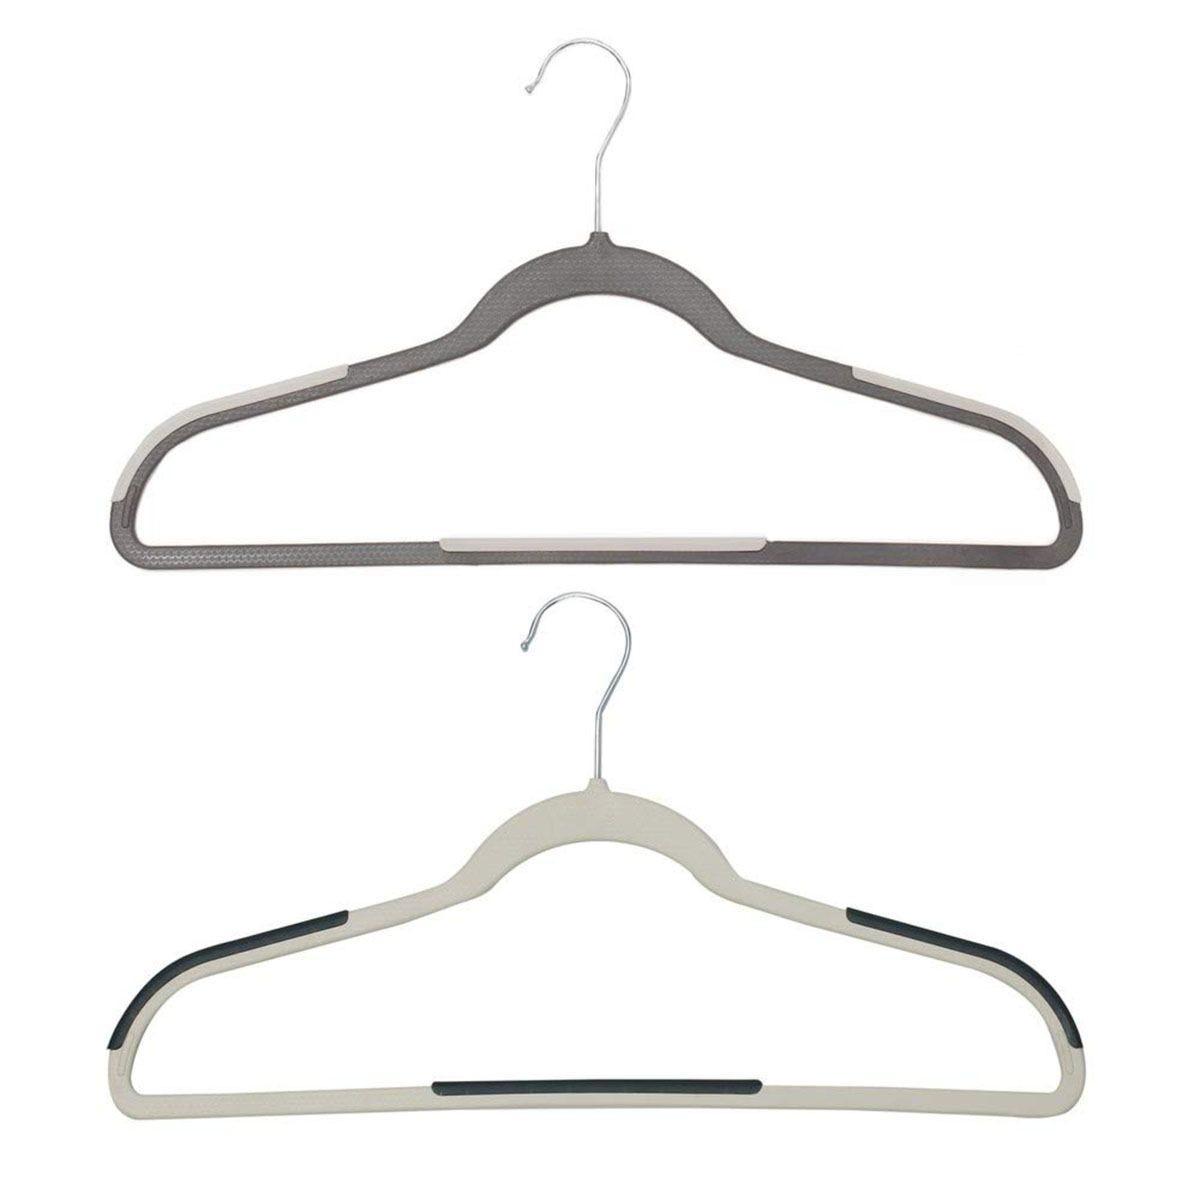 JVL Grey & White Plastic Space Saving Coat Hangers - Pack of 100